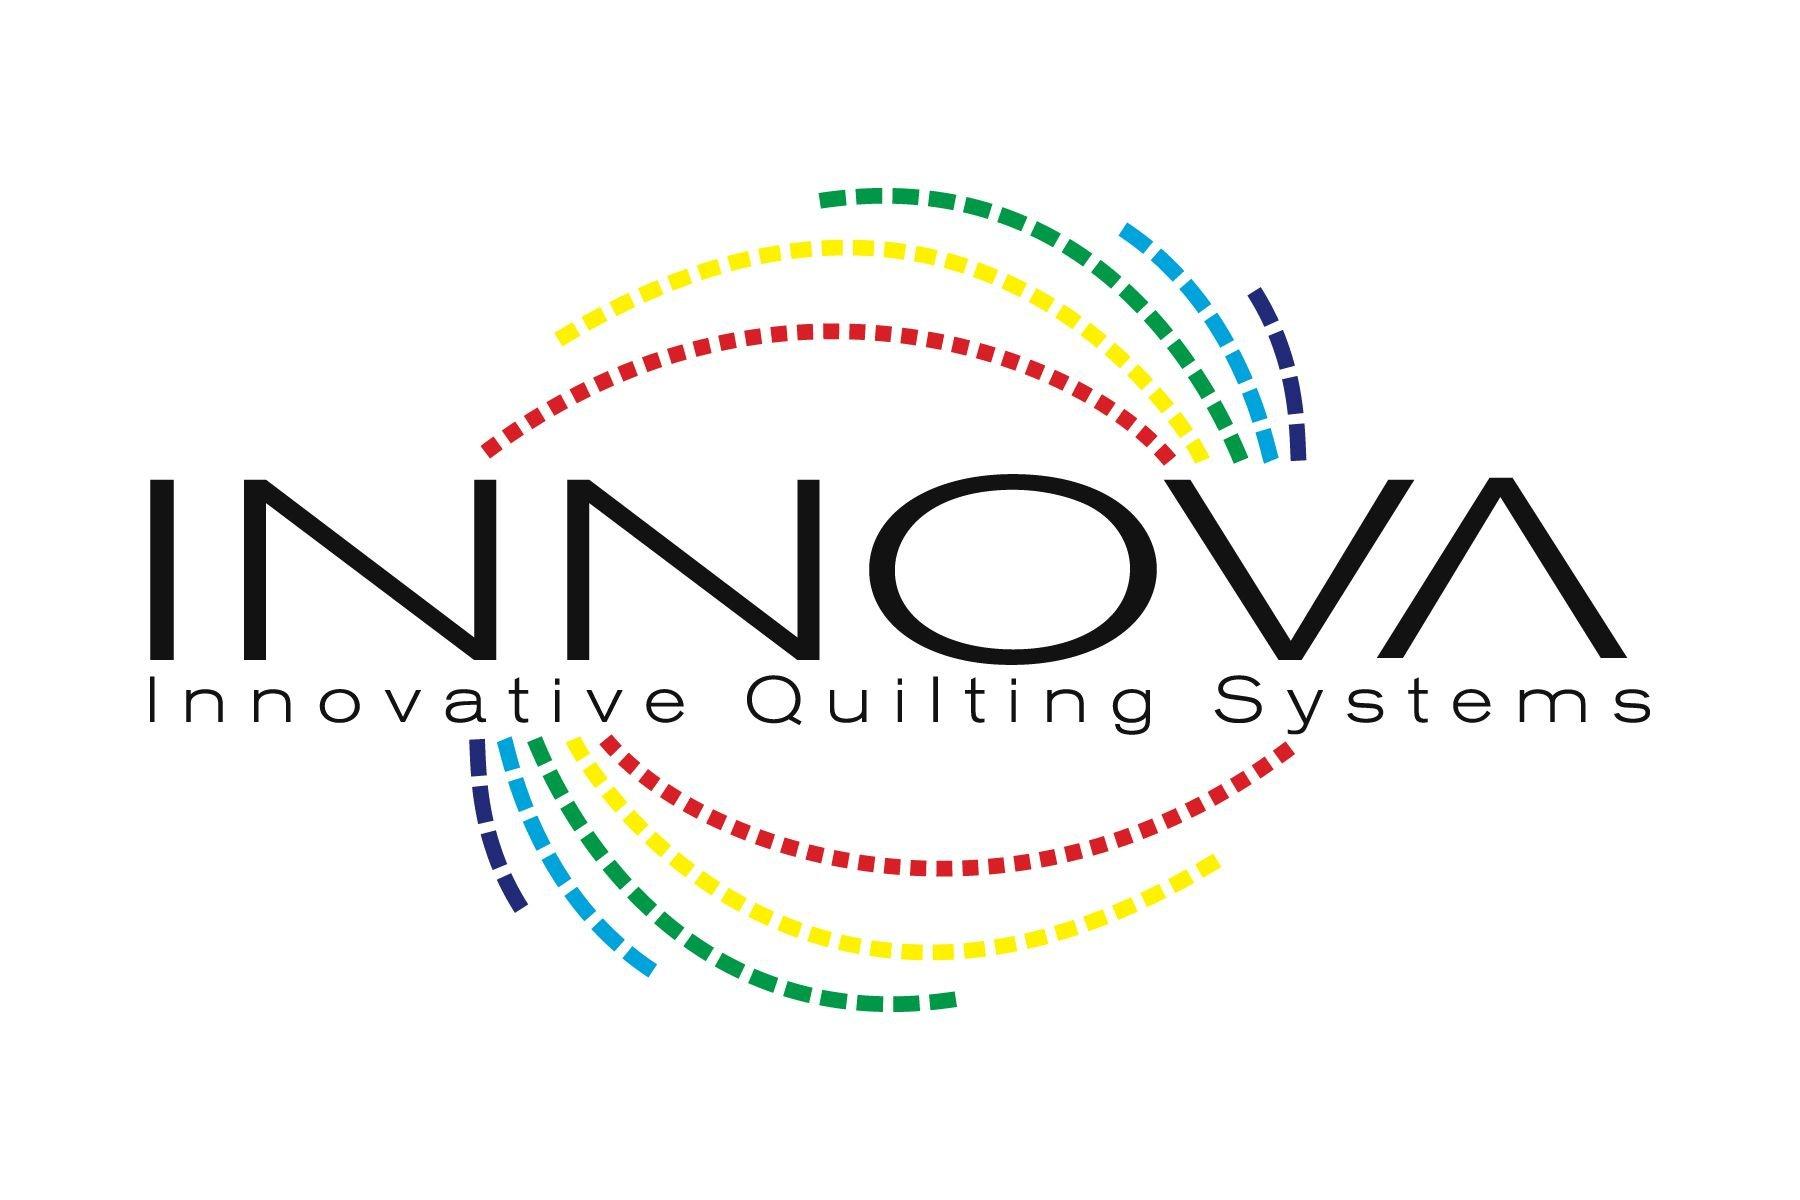 Innova Quilting Systems